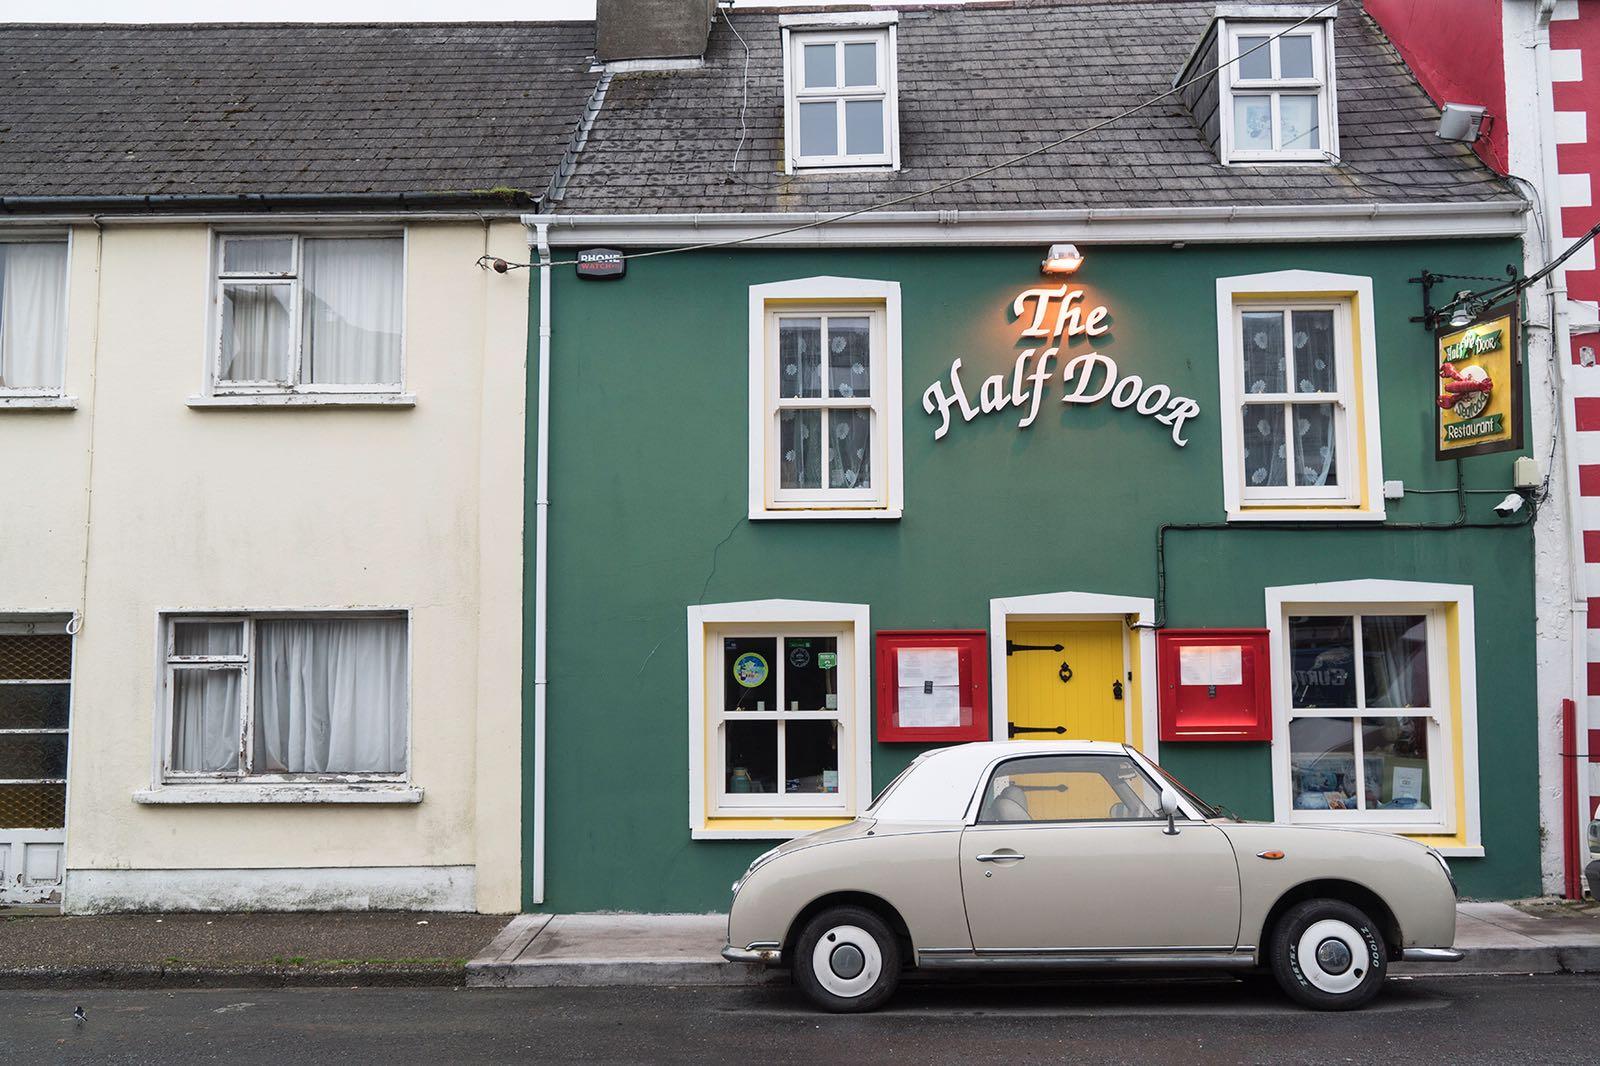 Auto in Dingle, Ireland.